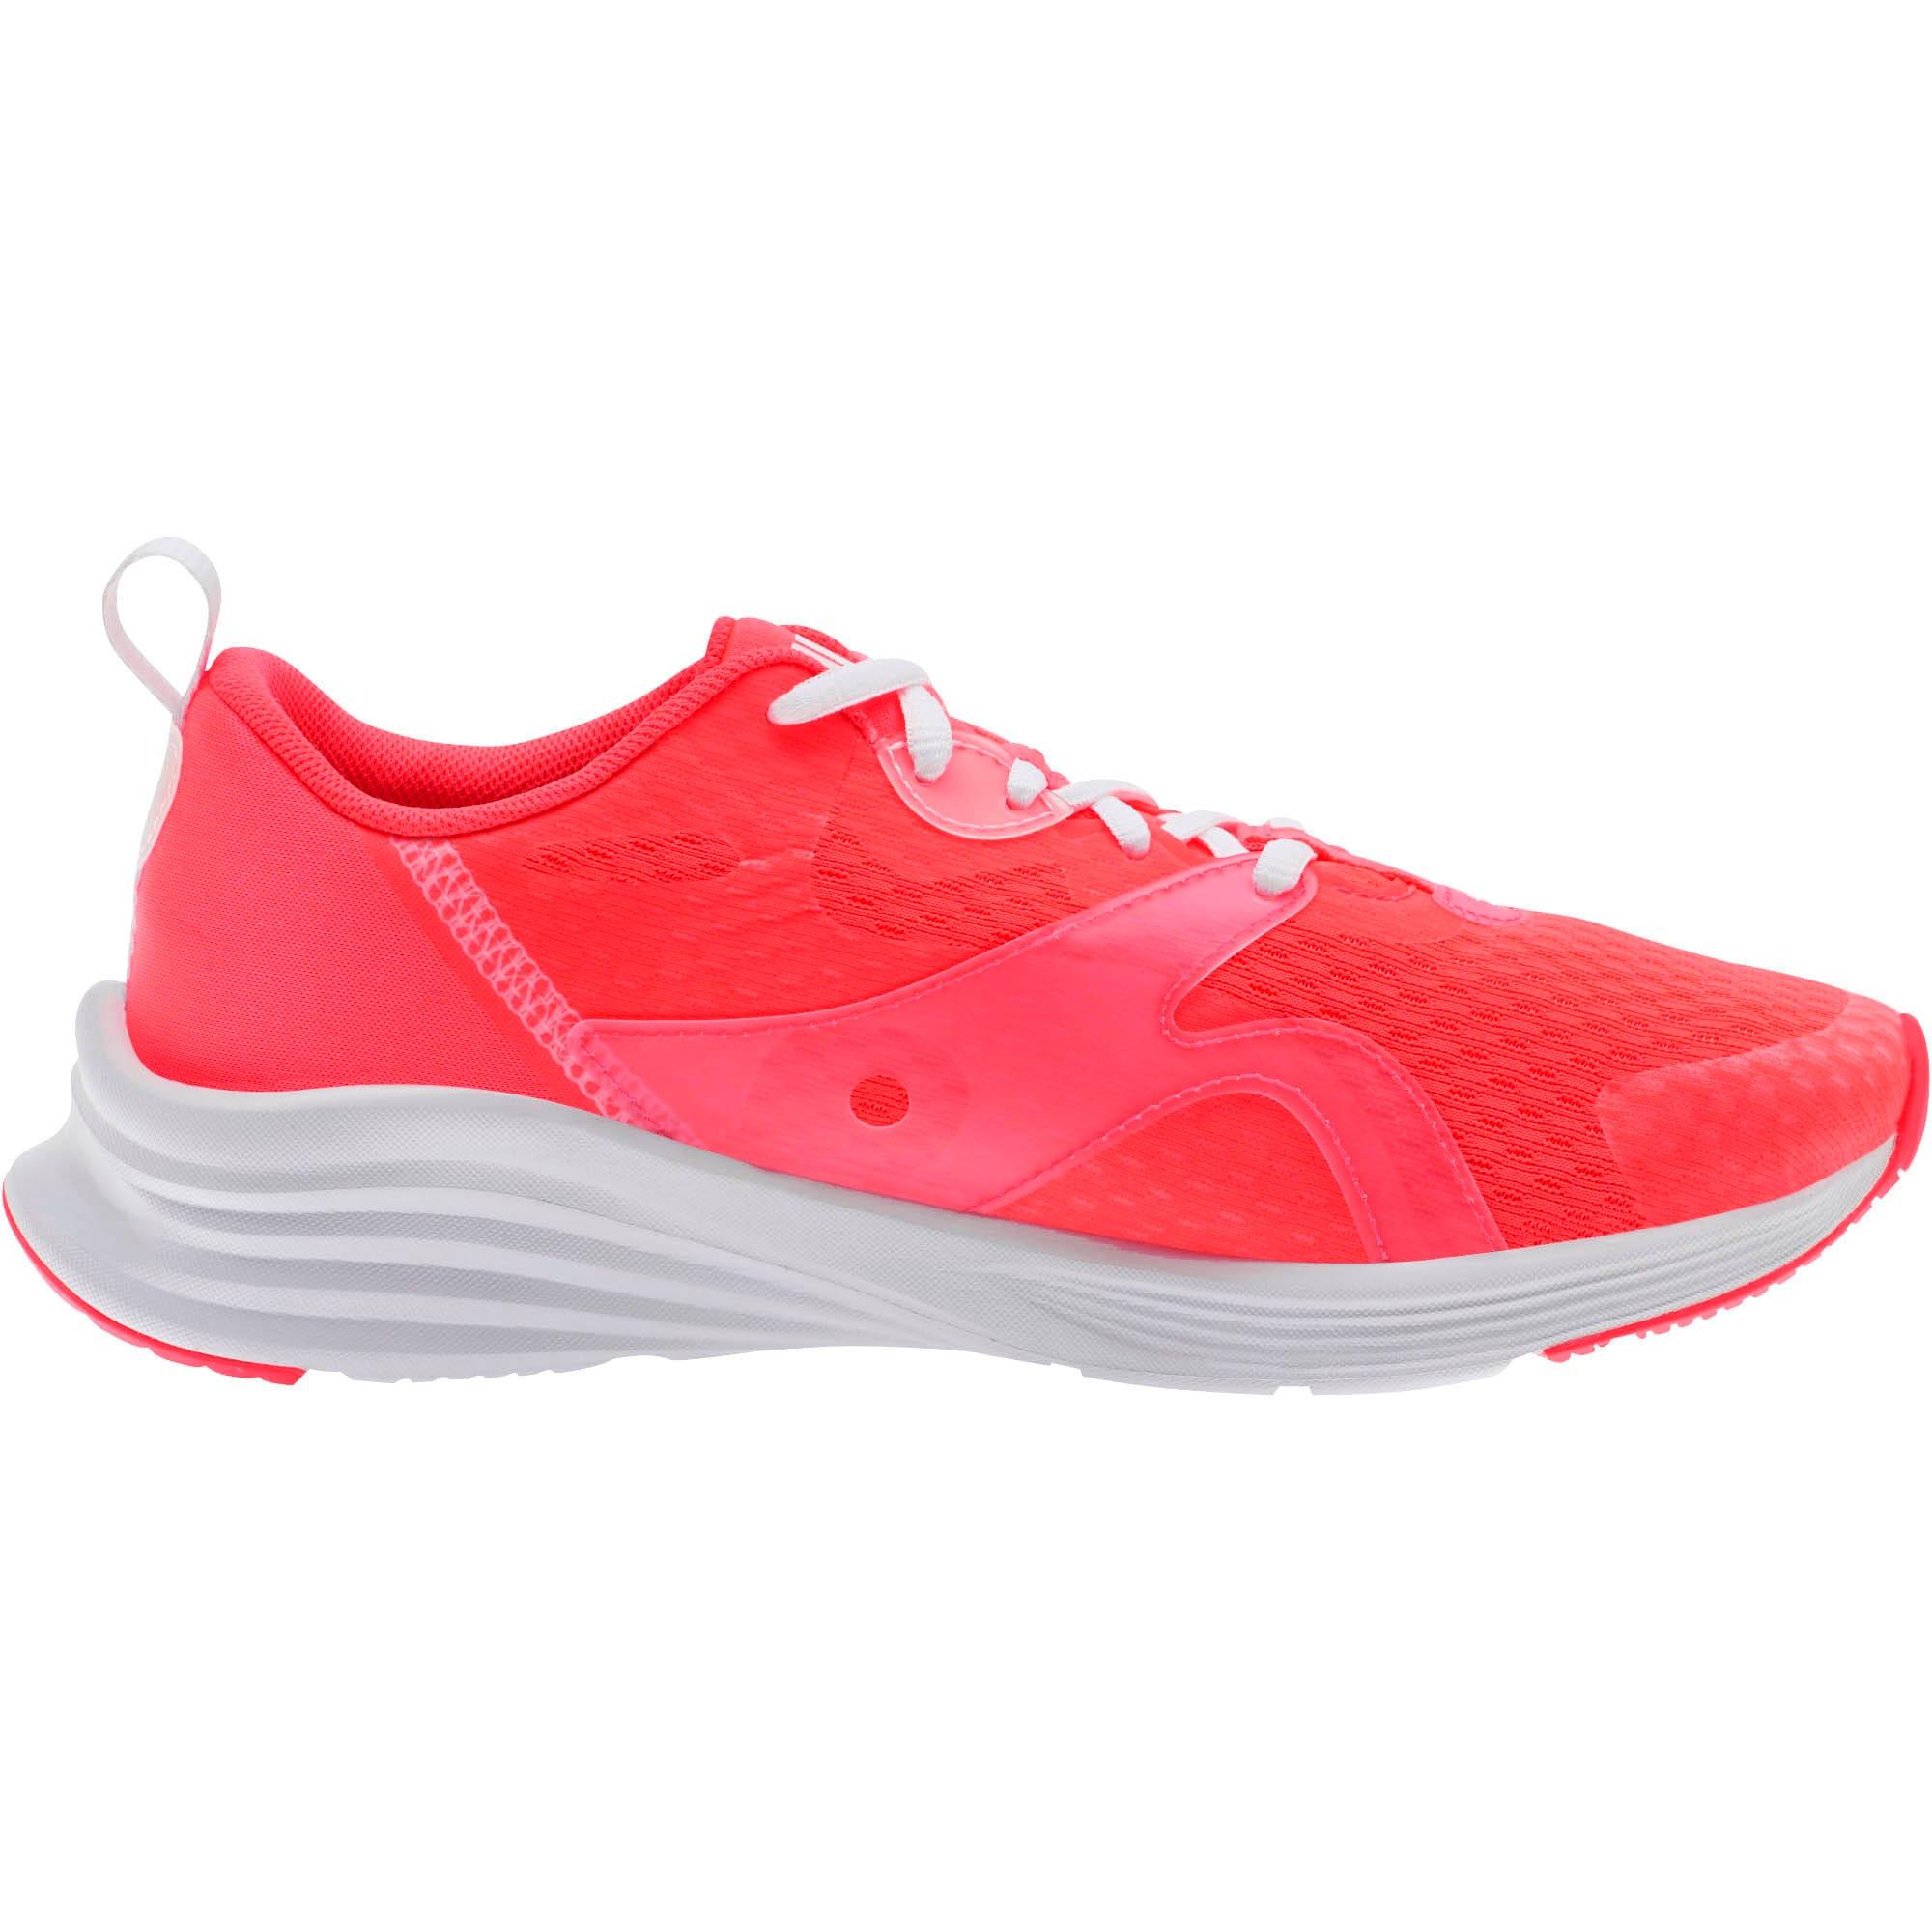 Thumbnail 4 of HYBRID Fuego Women's Running Shoes, Pink Alert-Puma White, medium